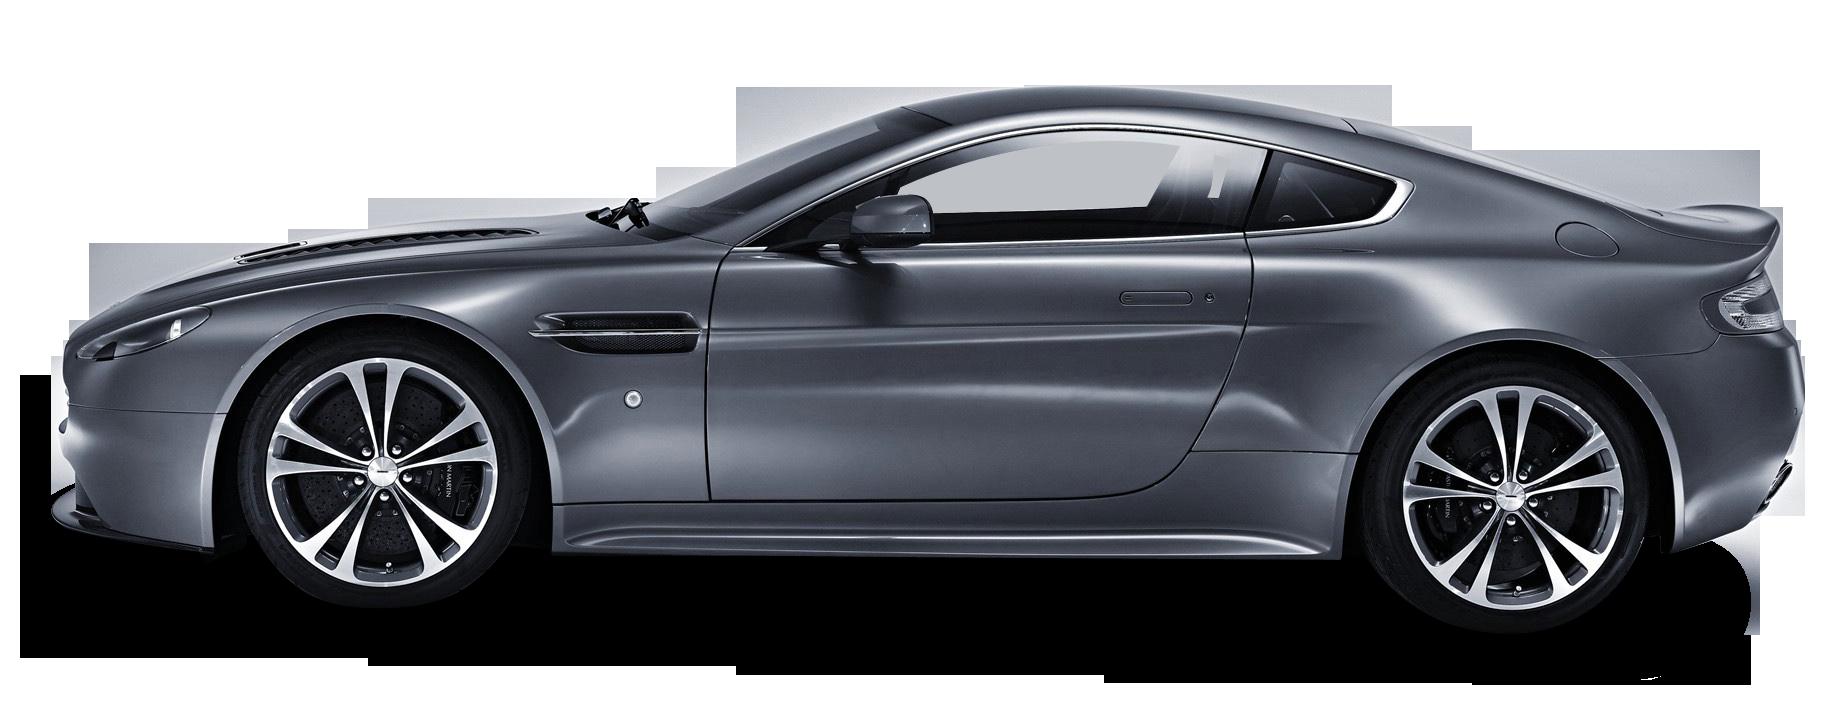 Grey Aston Martin V12 Vantage Luxury Car Png Image Purepng Free